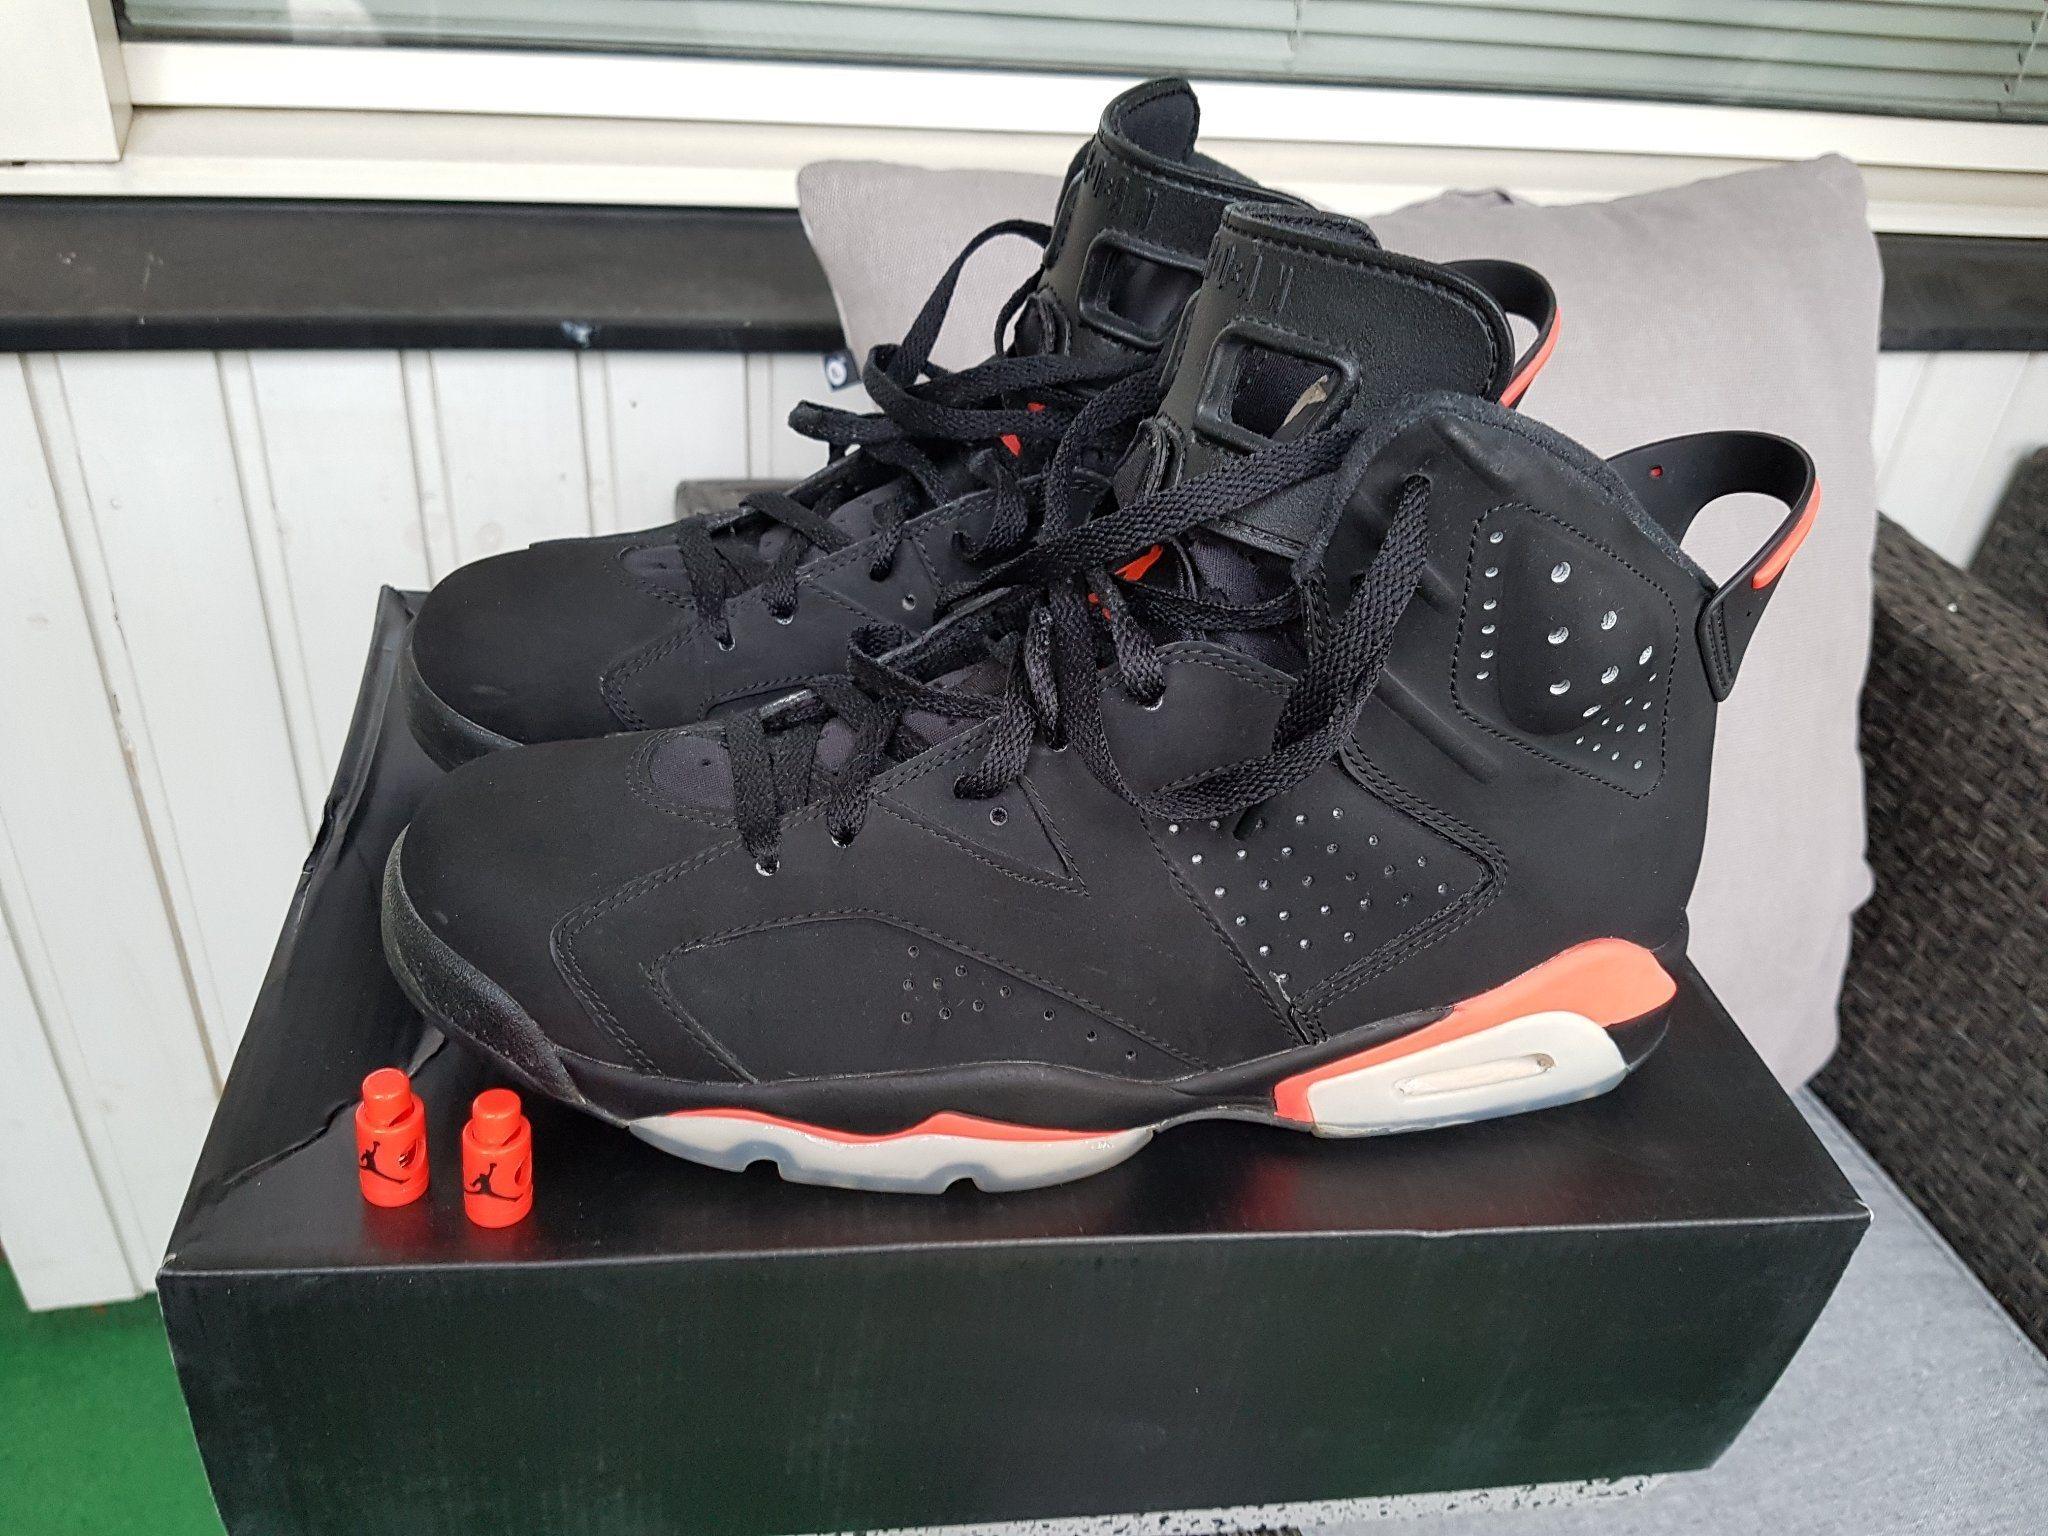 best authentic 925a6 5c0b1 Nike Air Jordan 6 Retro Black Infrared - US10 EU44